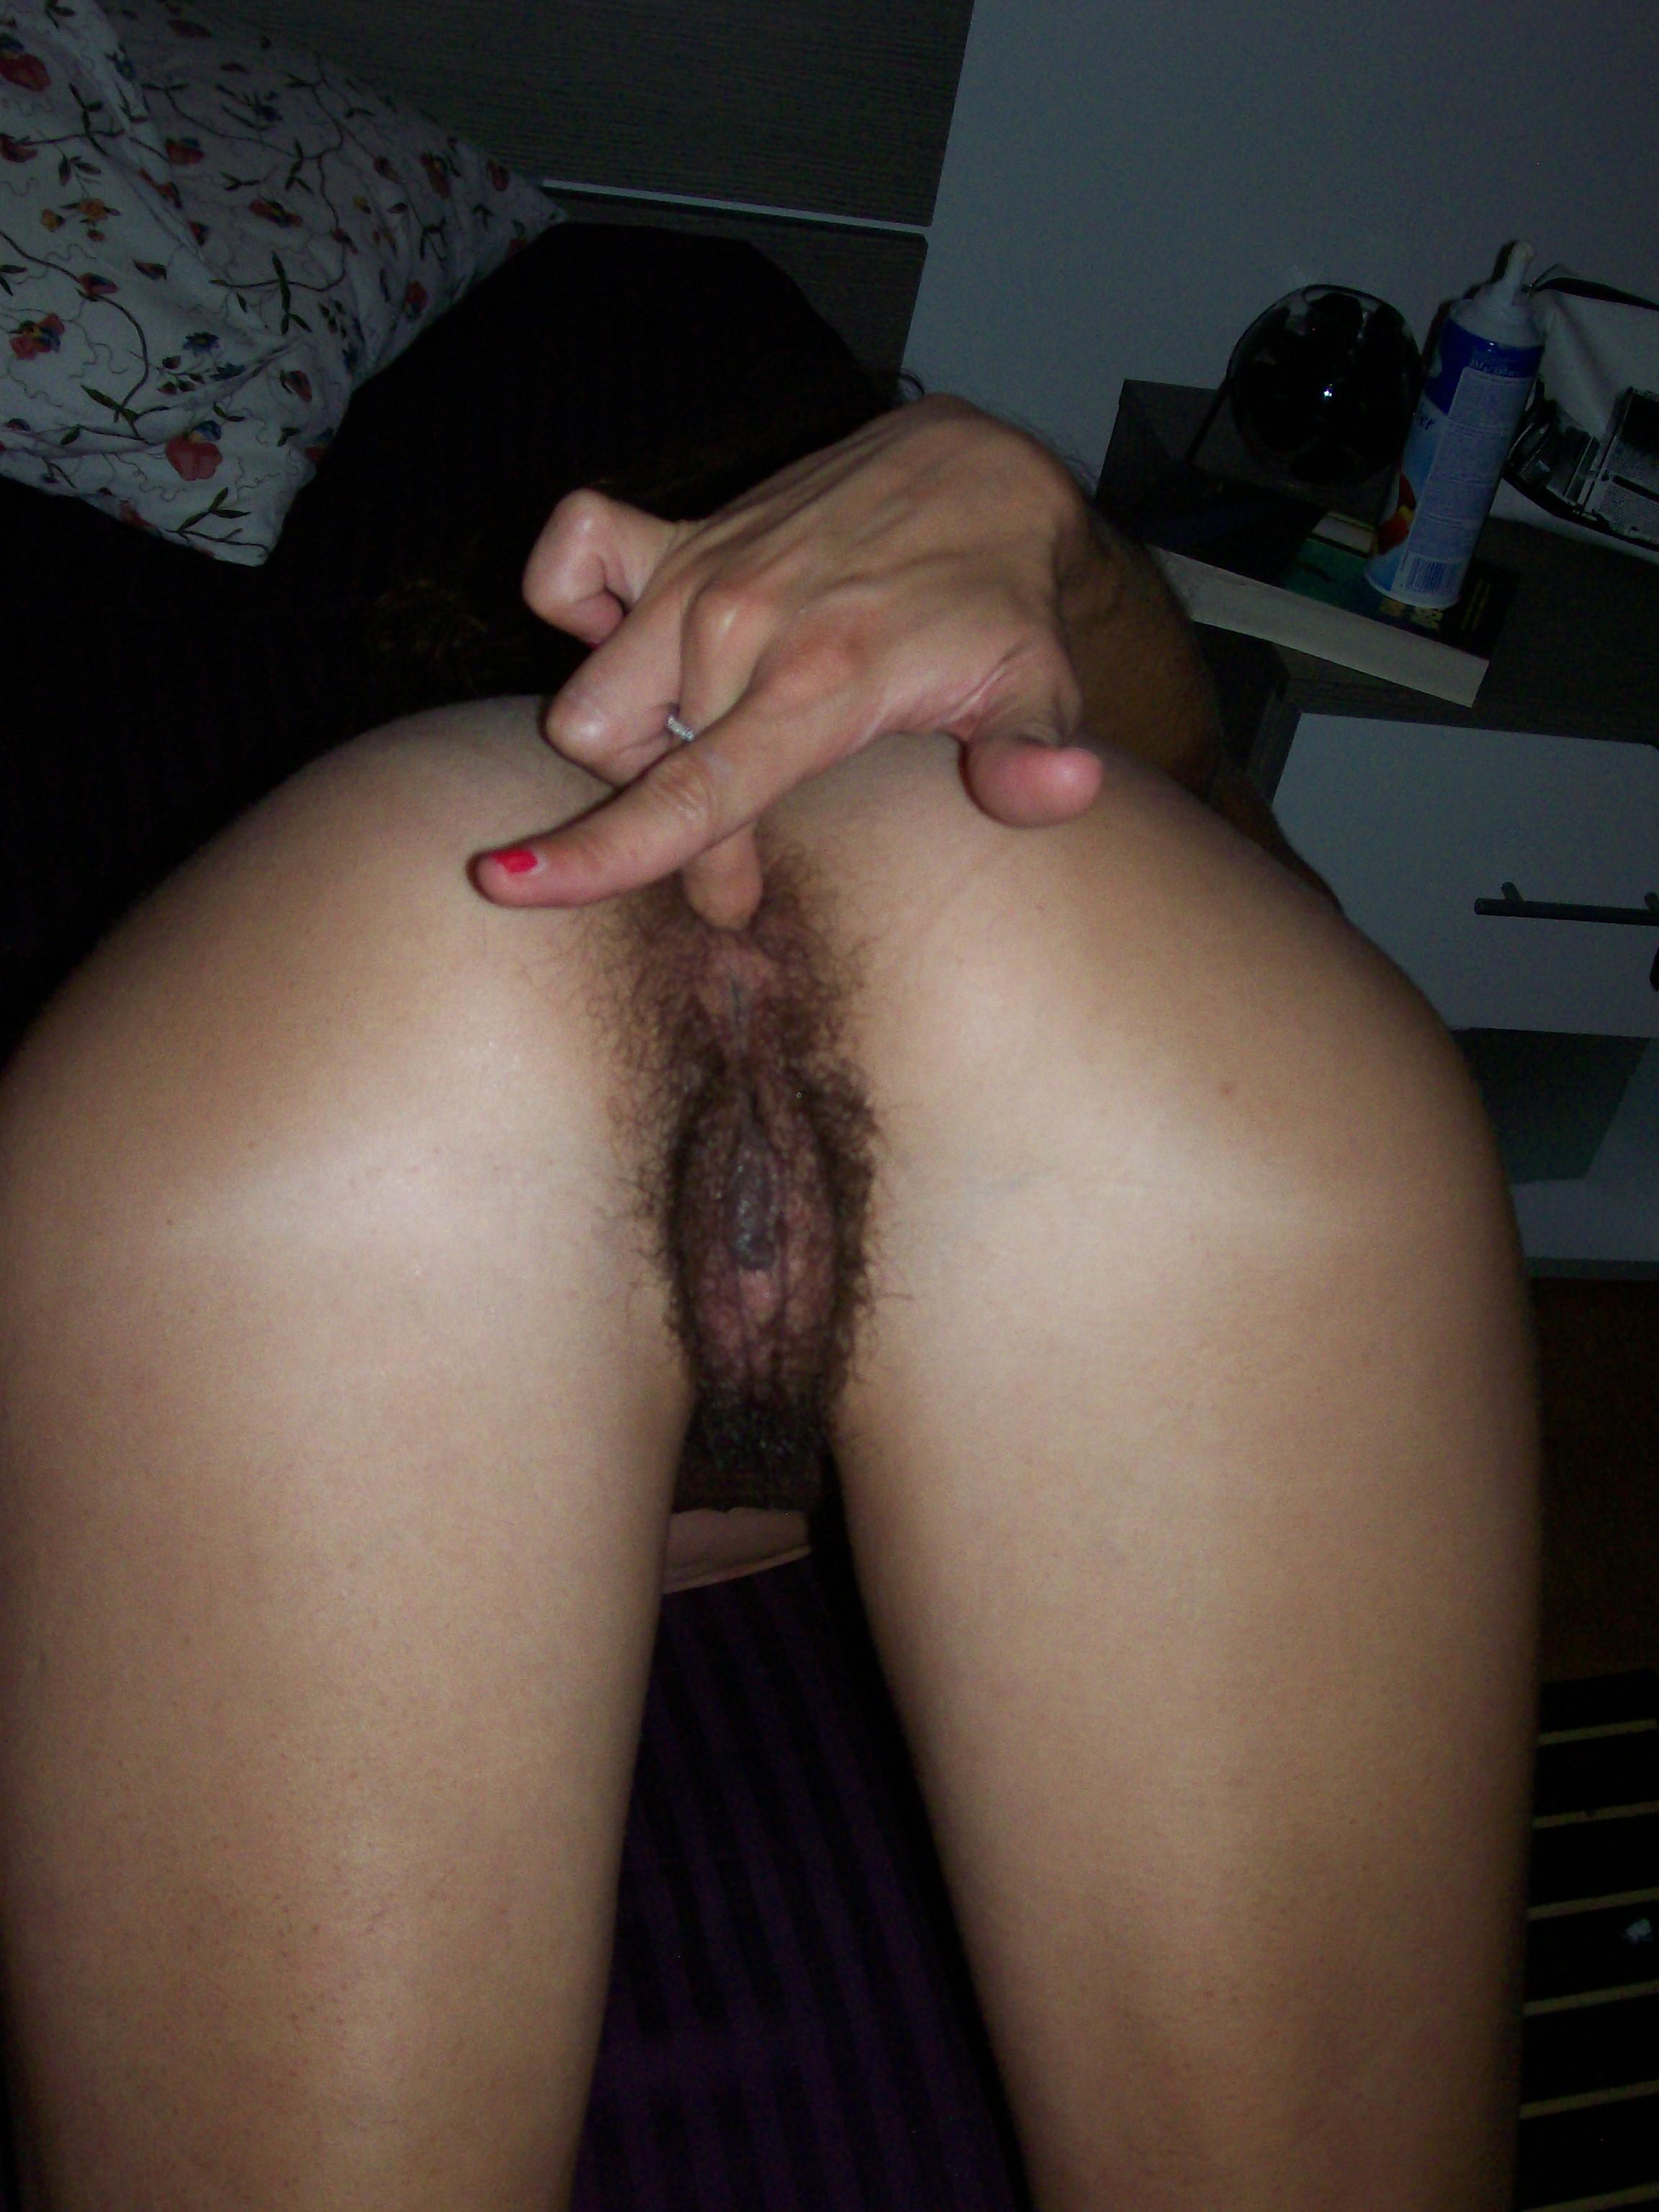 fingering photos anal